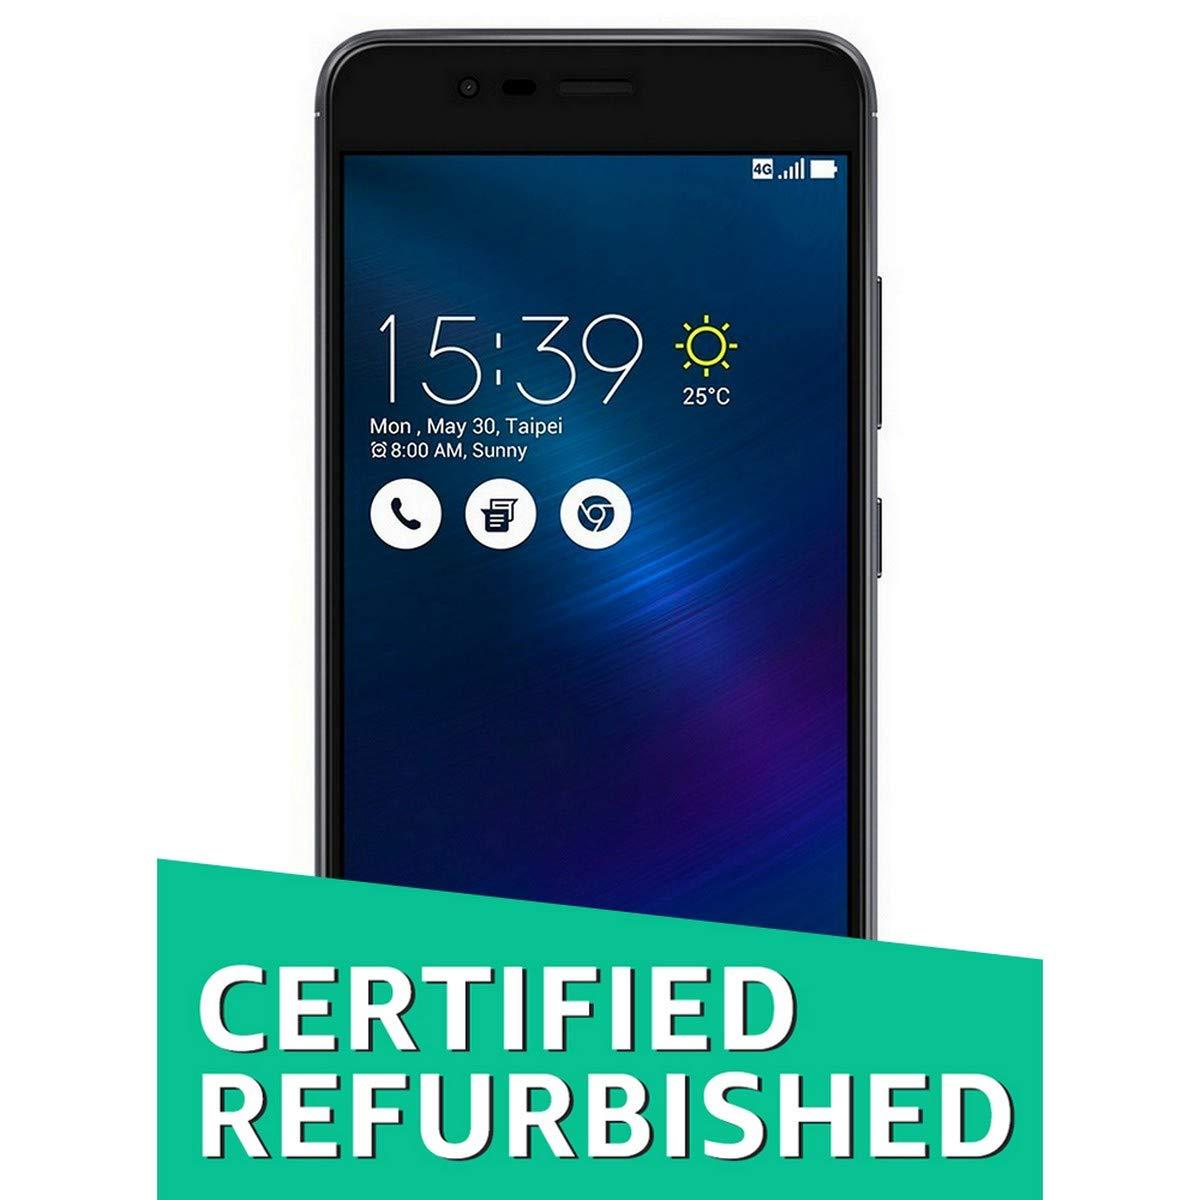 Promo Asus Zenfone Go 16gb 2gb Ram 5 Inch Zb500kl Silver Blue 2 Ze551ml 32gb Garansi Resmi 1 Tahun Certified Refurbished 3 Max Zc520tl Grey